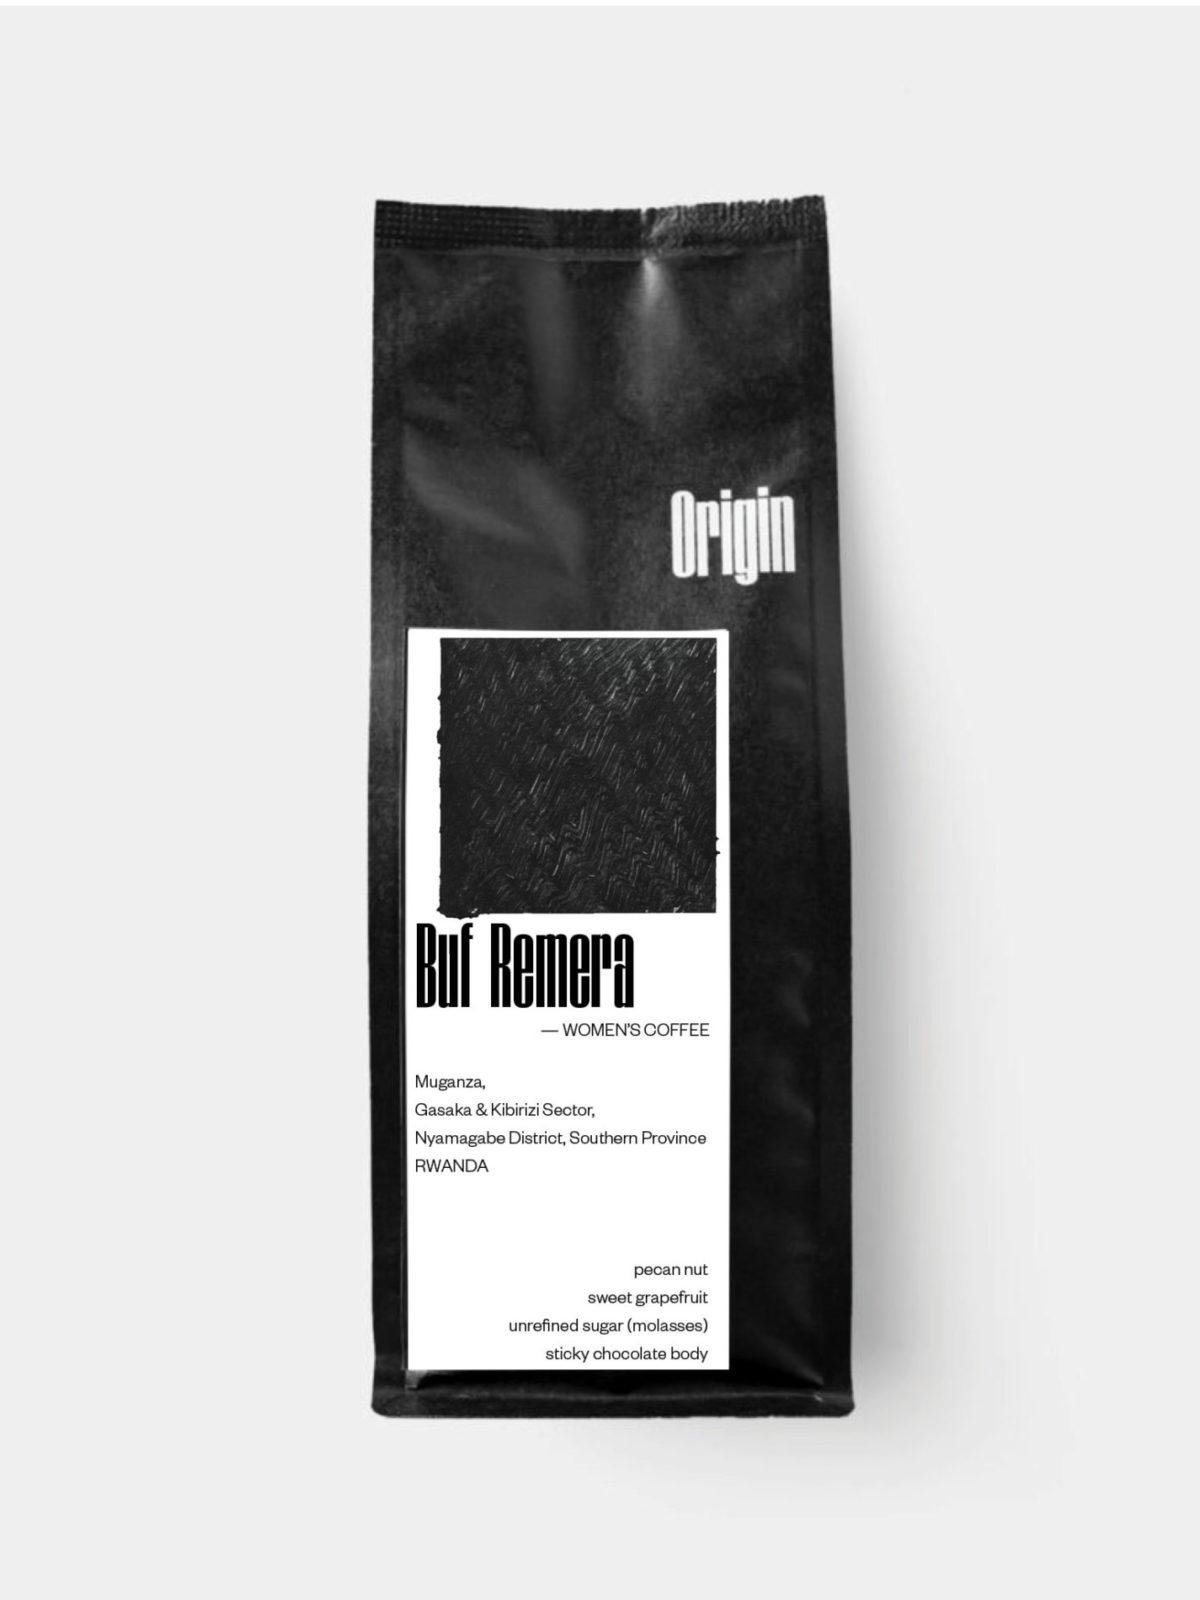 Rwanda Buf Remera Women's Coffee - on the 250g bag